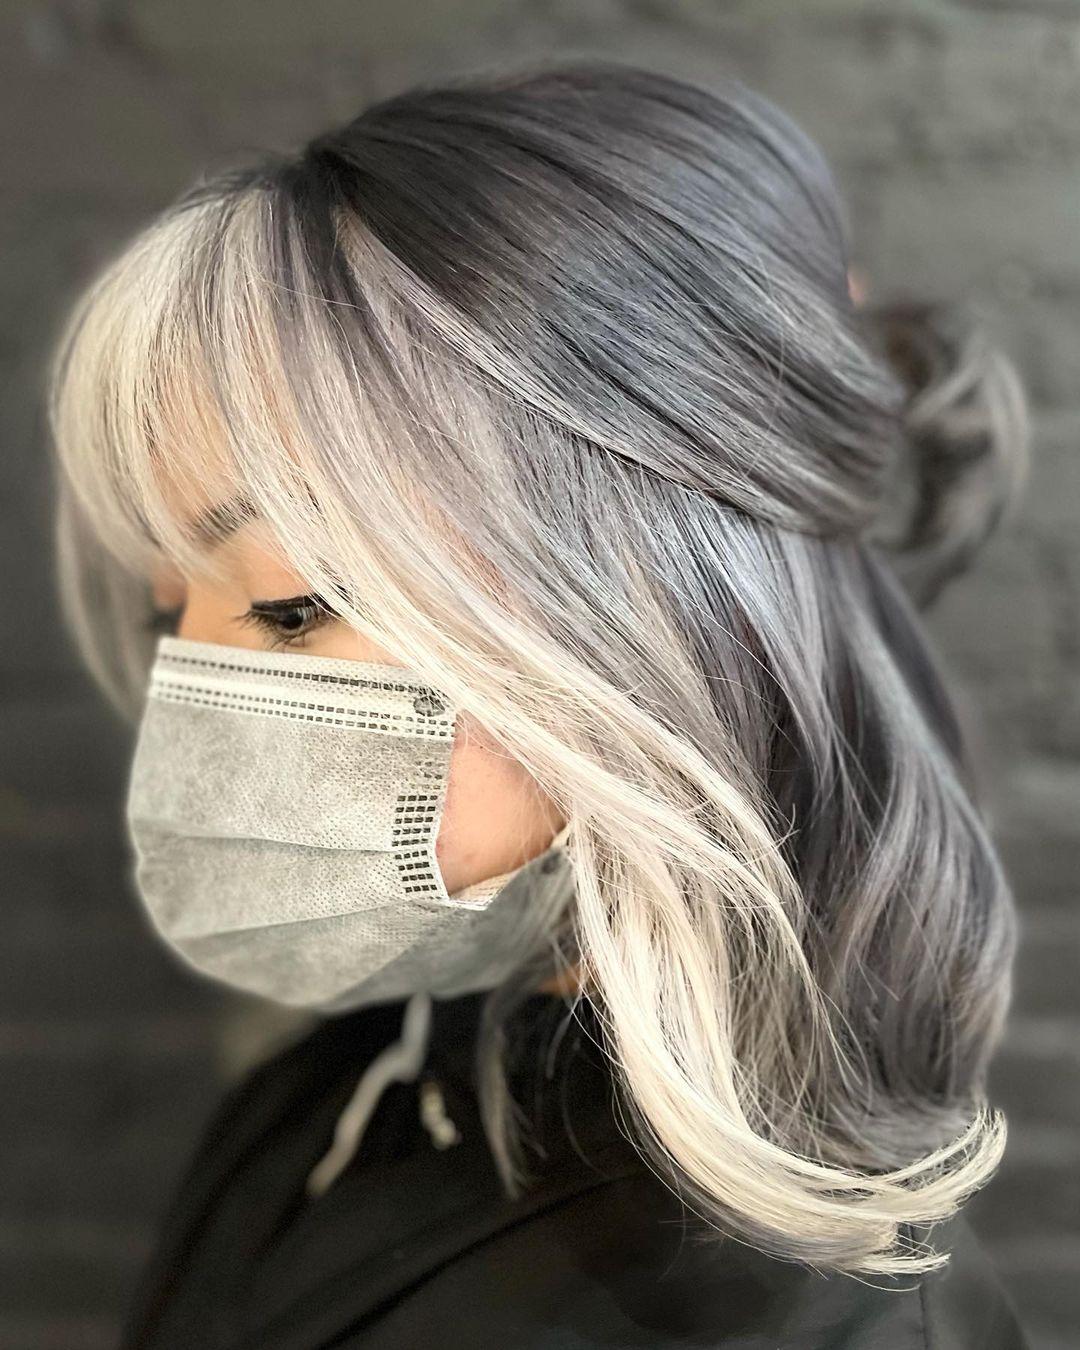 Shoulder-Length Haircut for Gray Hair